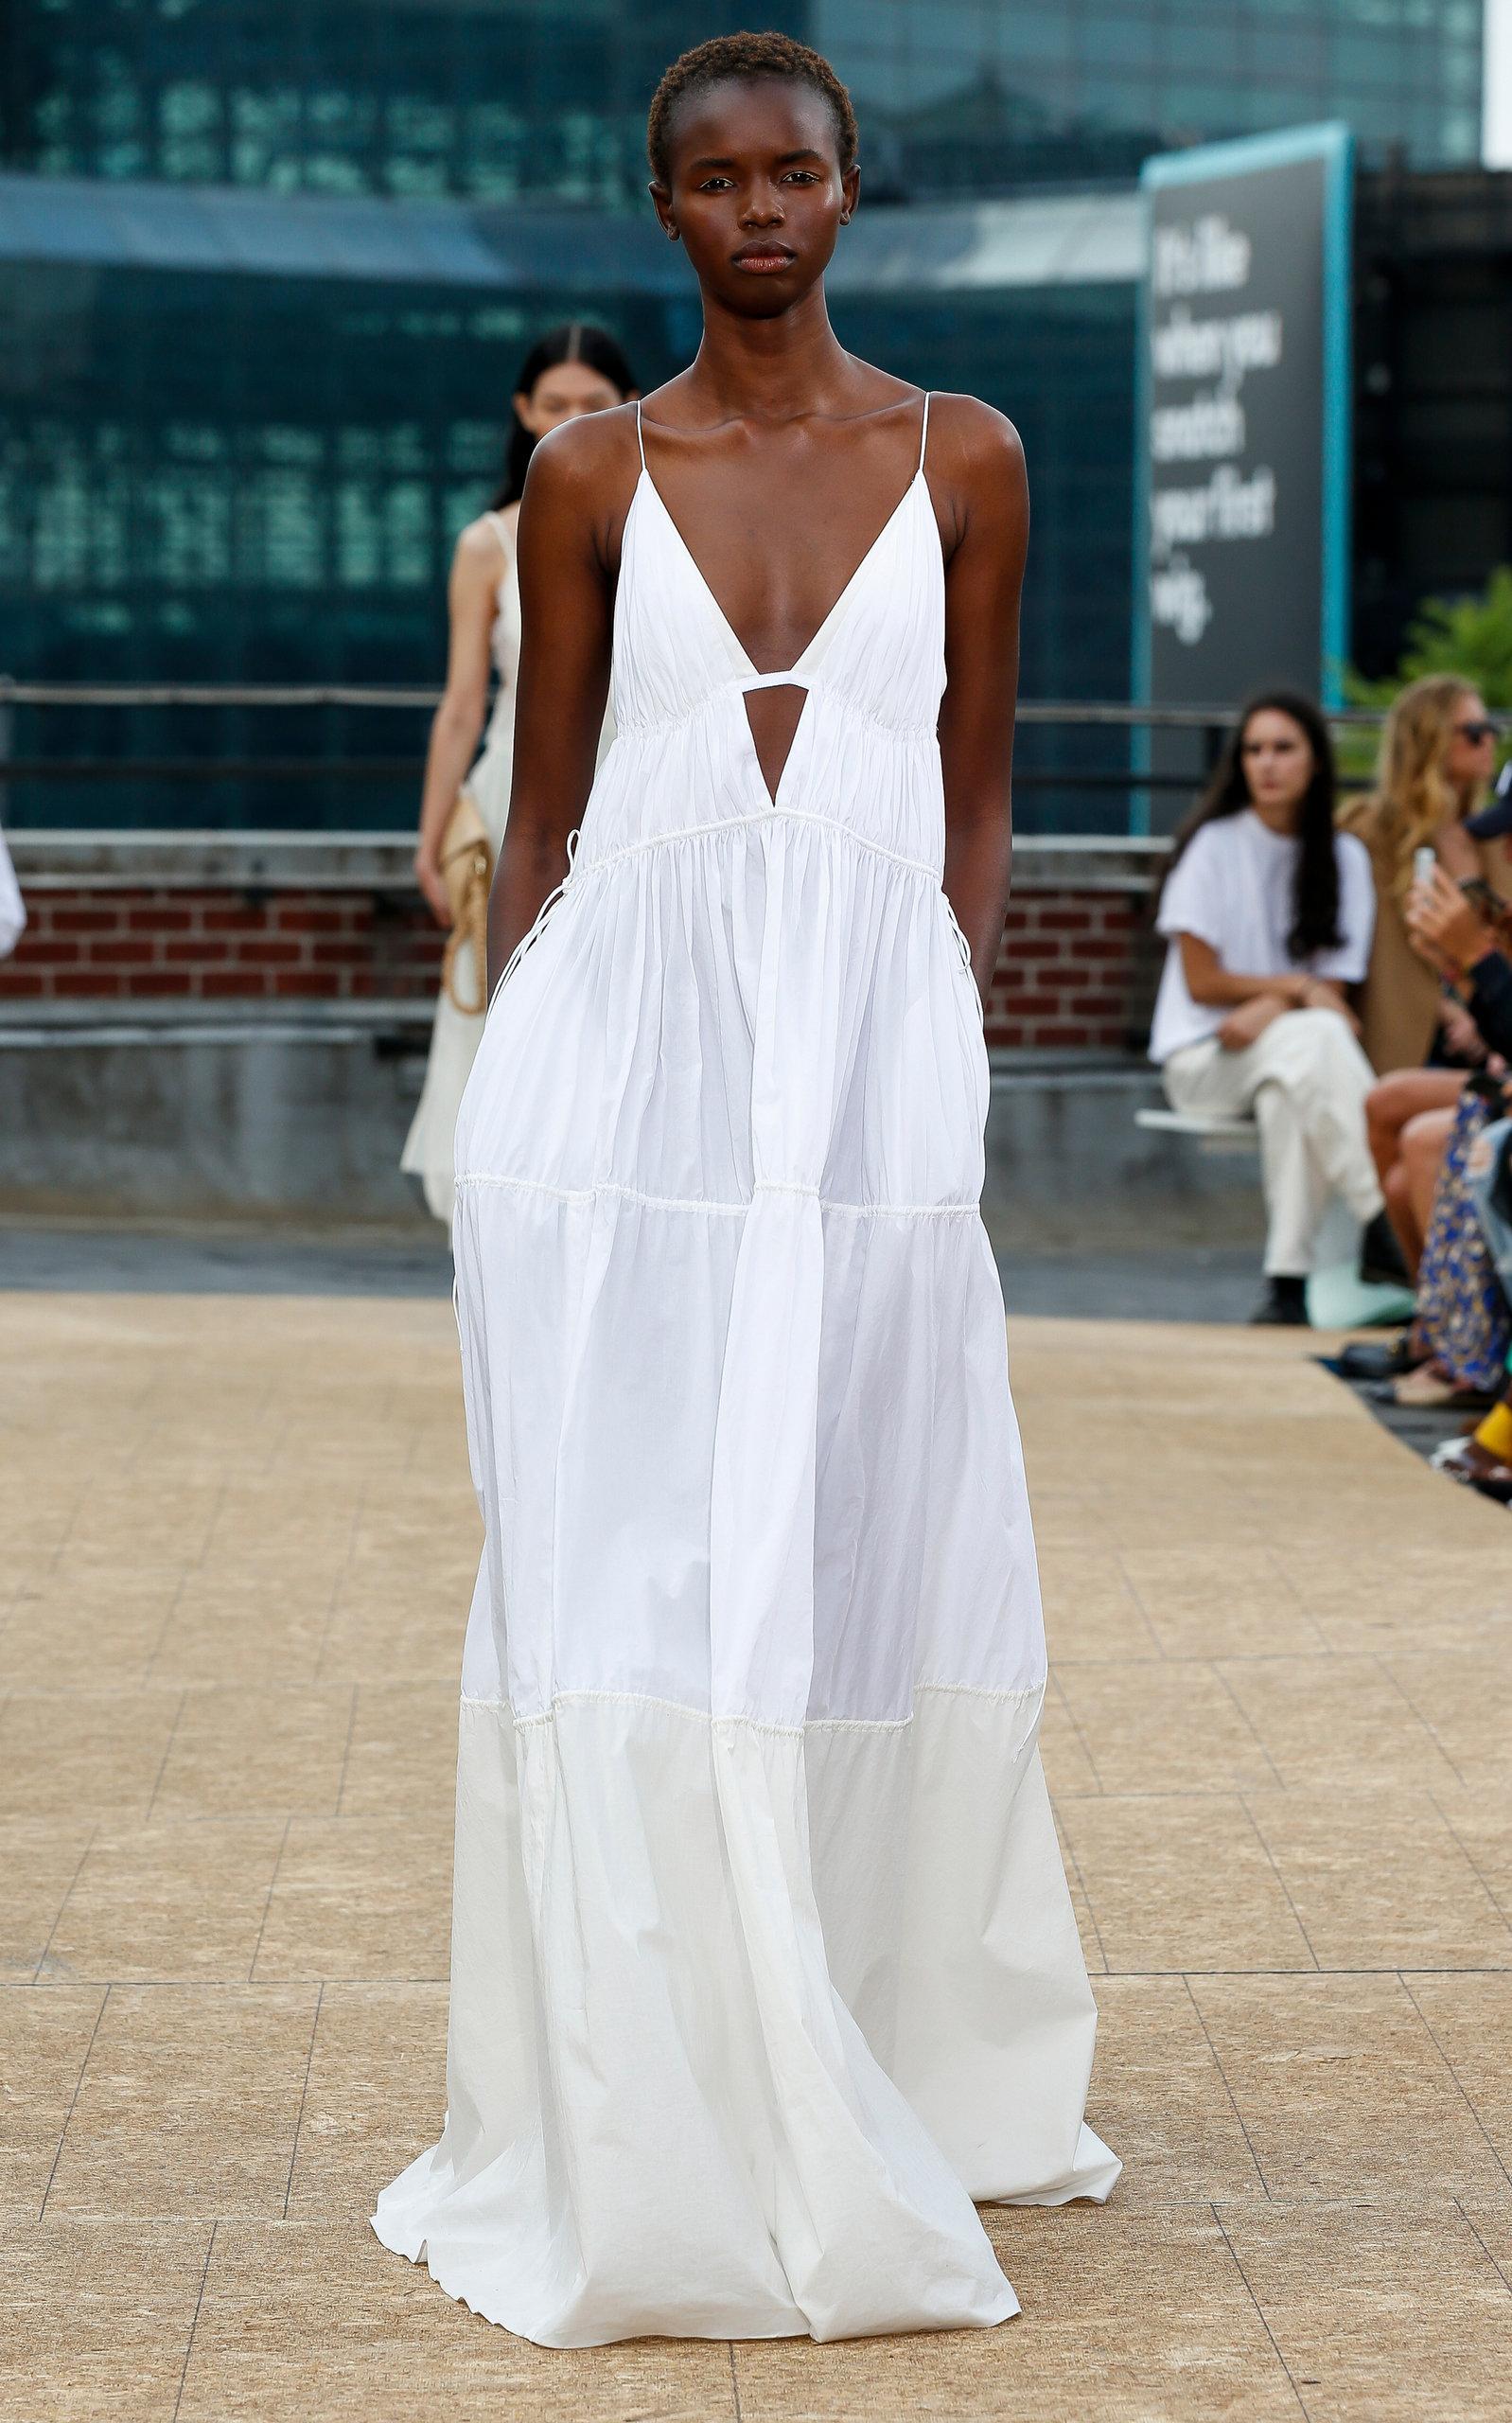 Image result for white maxi dress simkhai fashion show